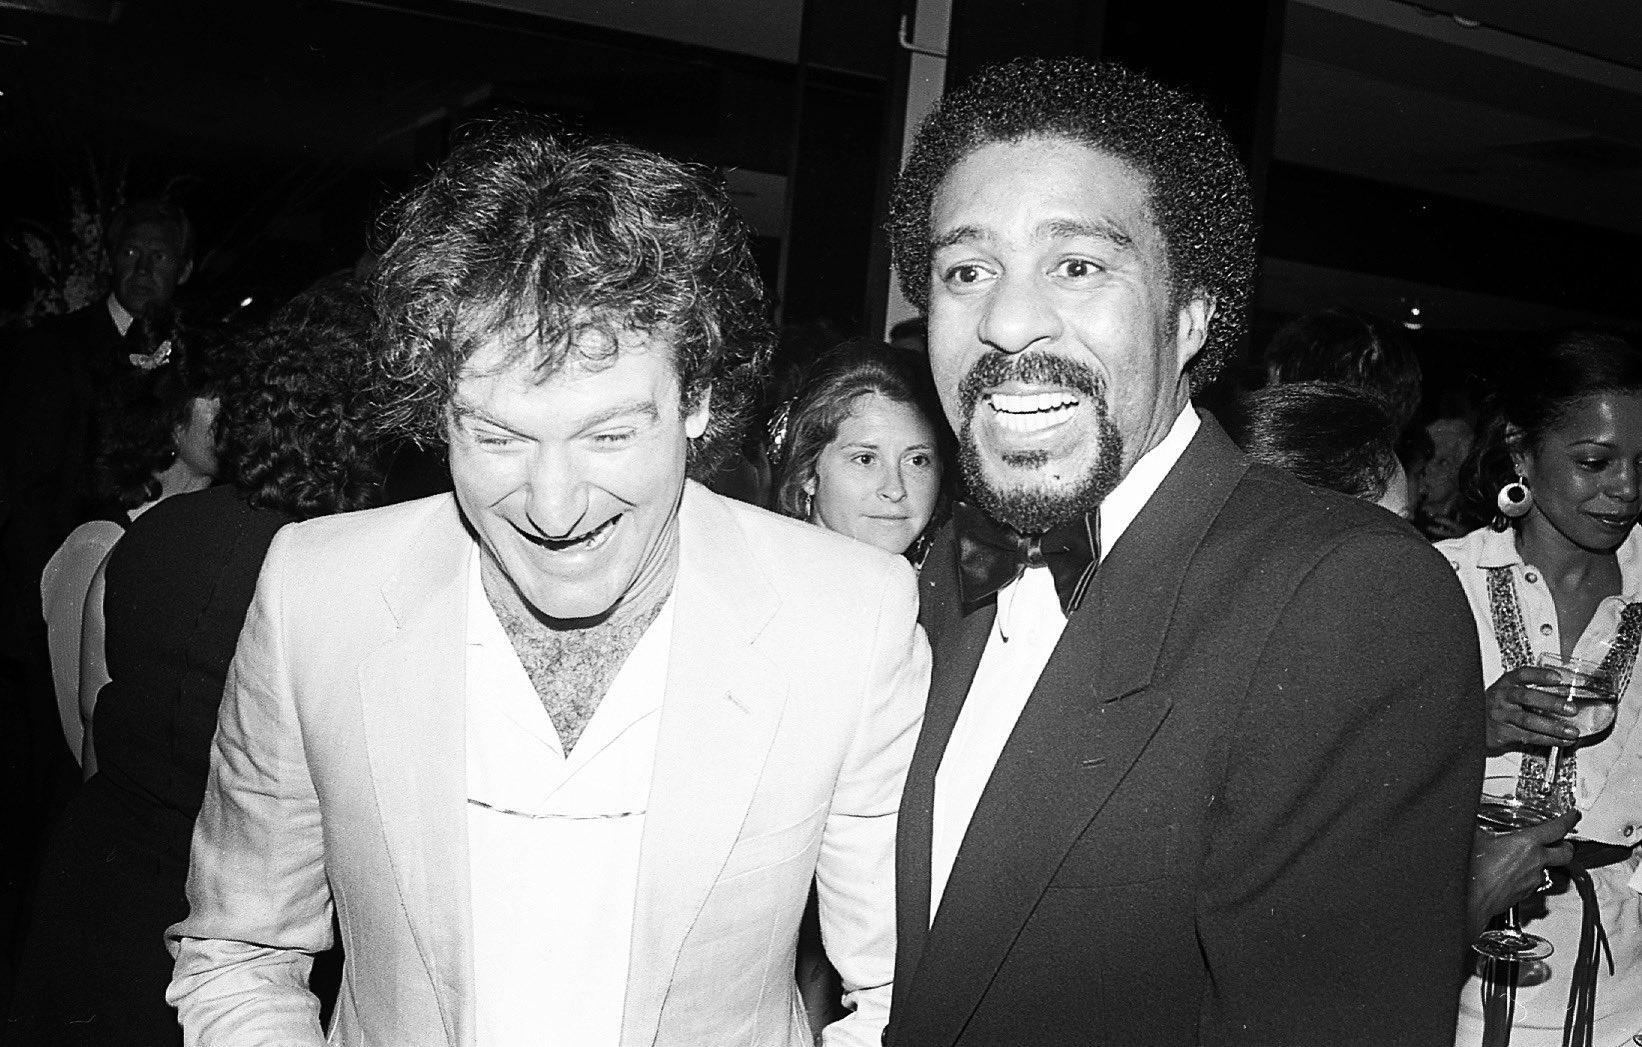 Black and white photograph of Robin Williams and Richard Pryor.